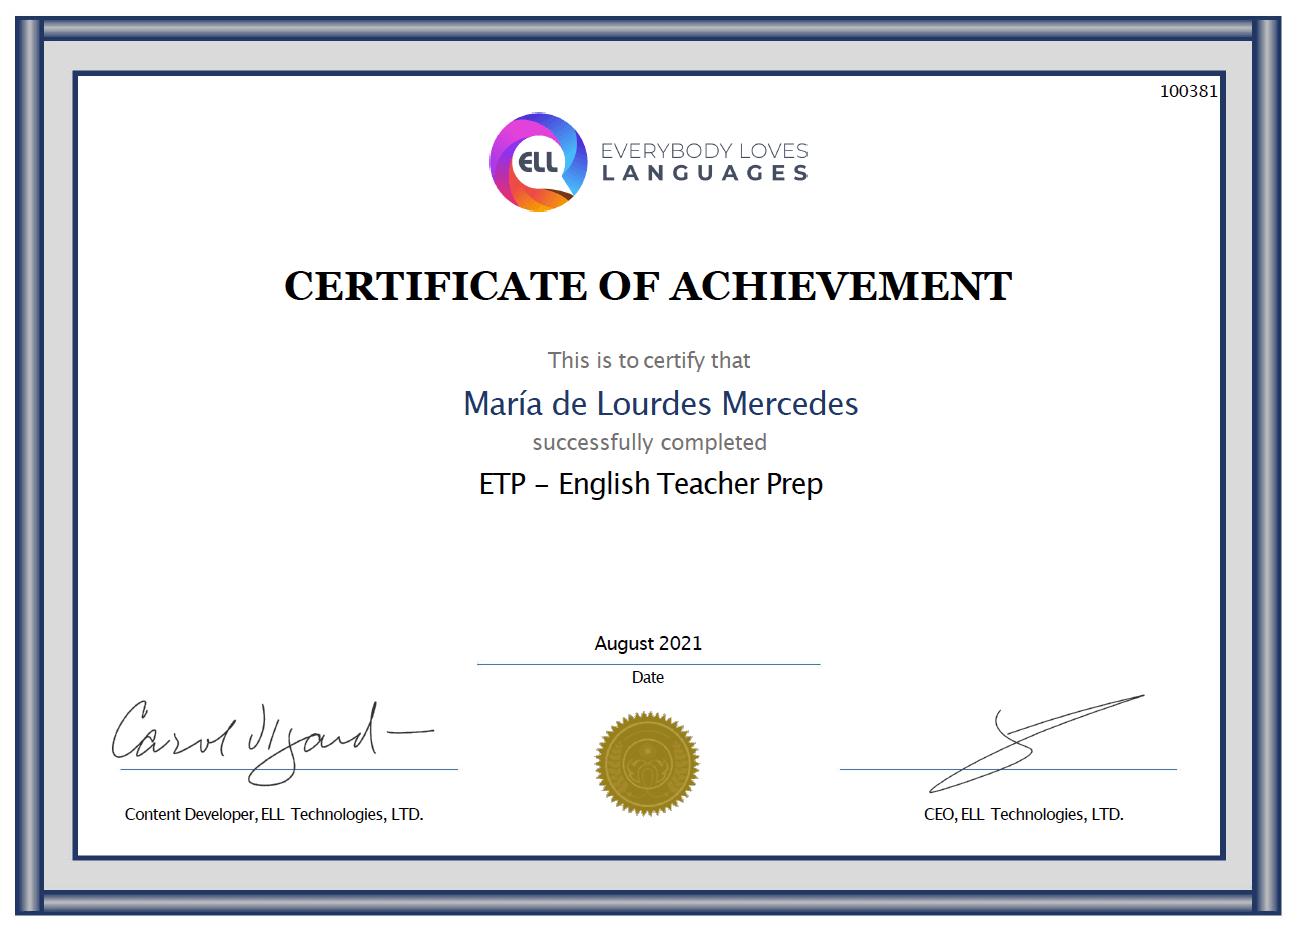 ETP Certificate